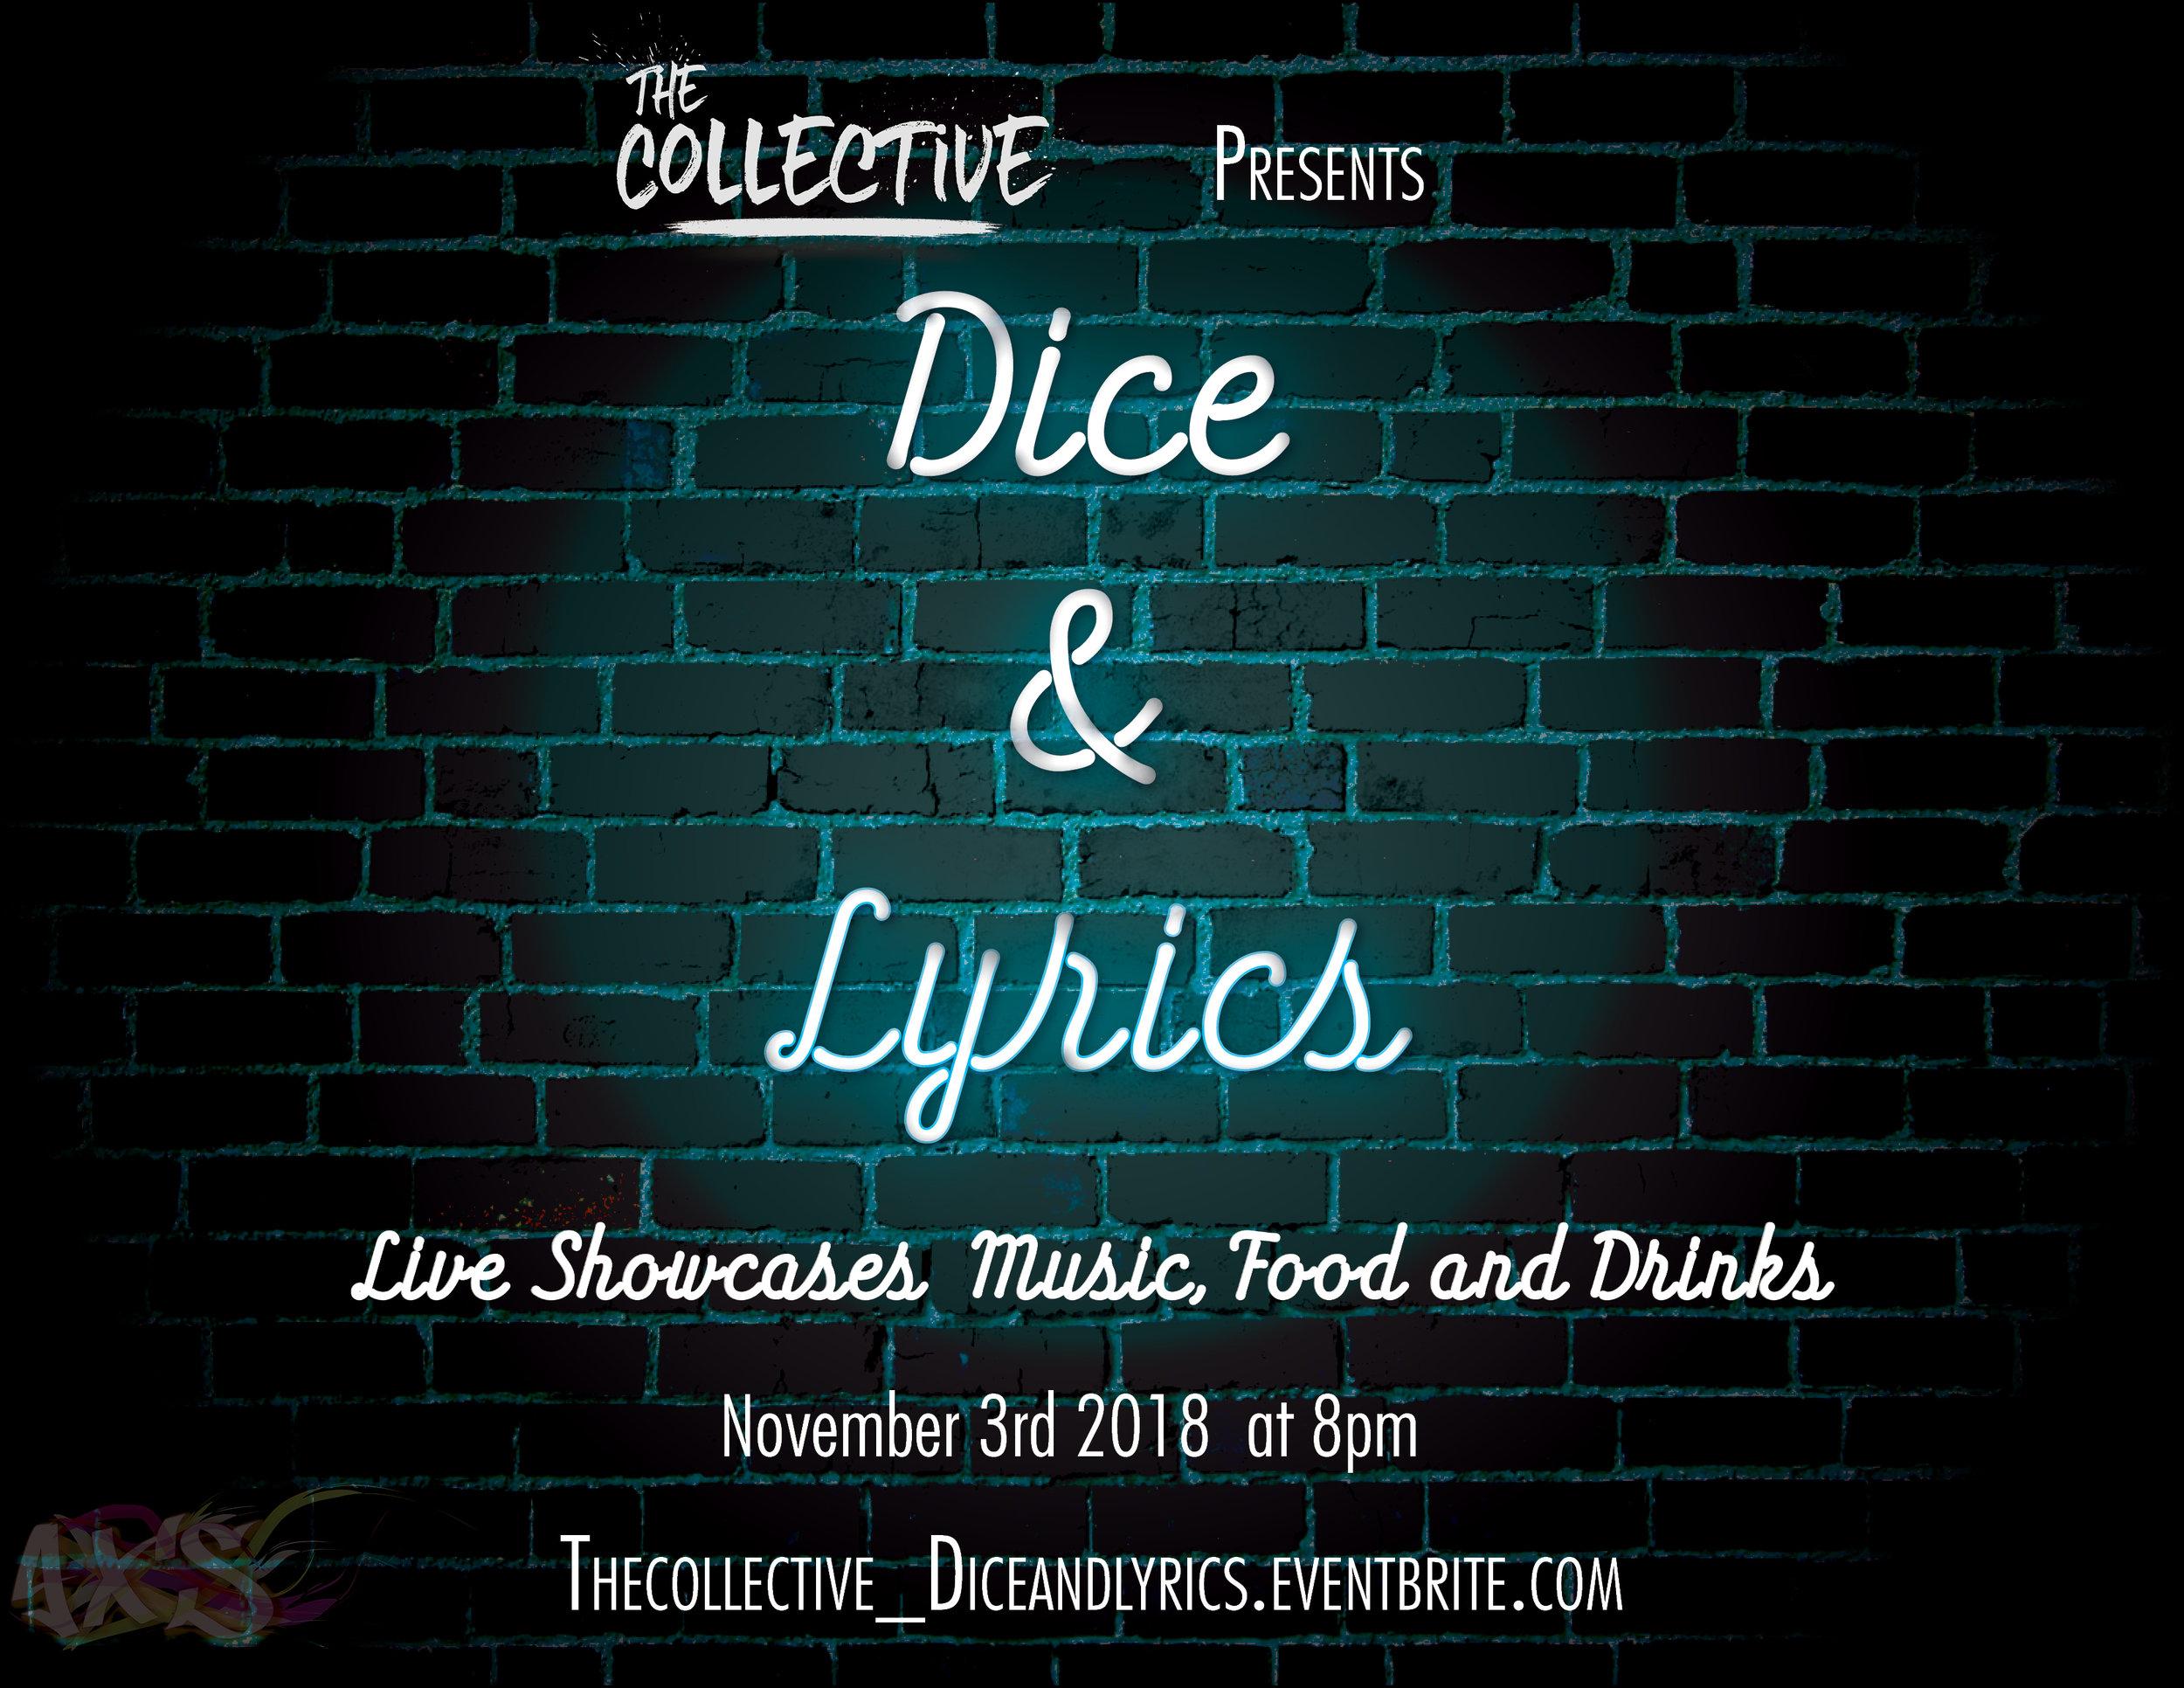 Dice & Lyrics V3.jpg